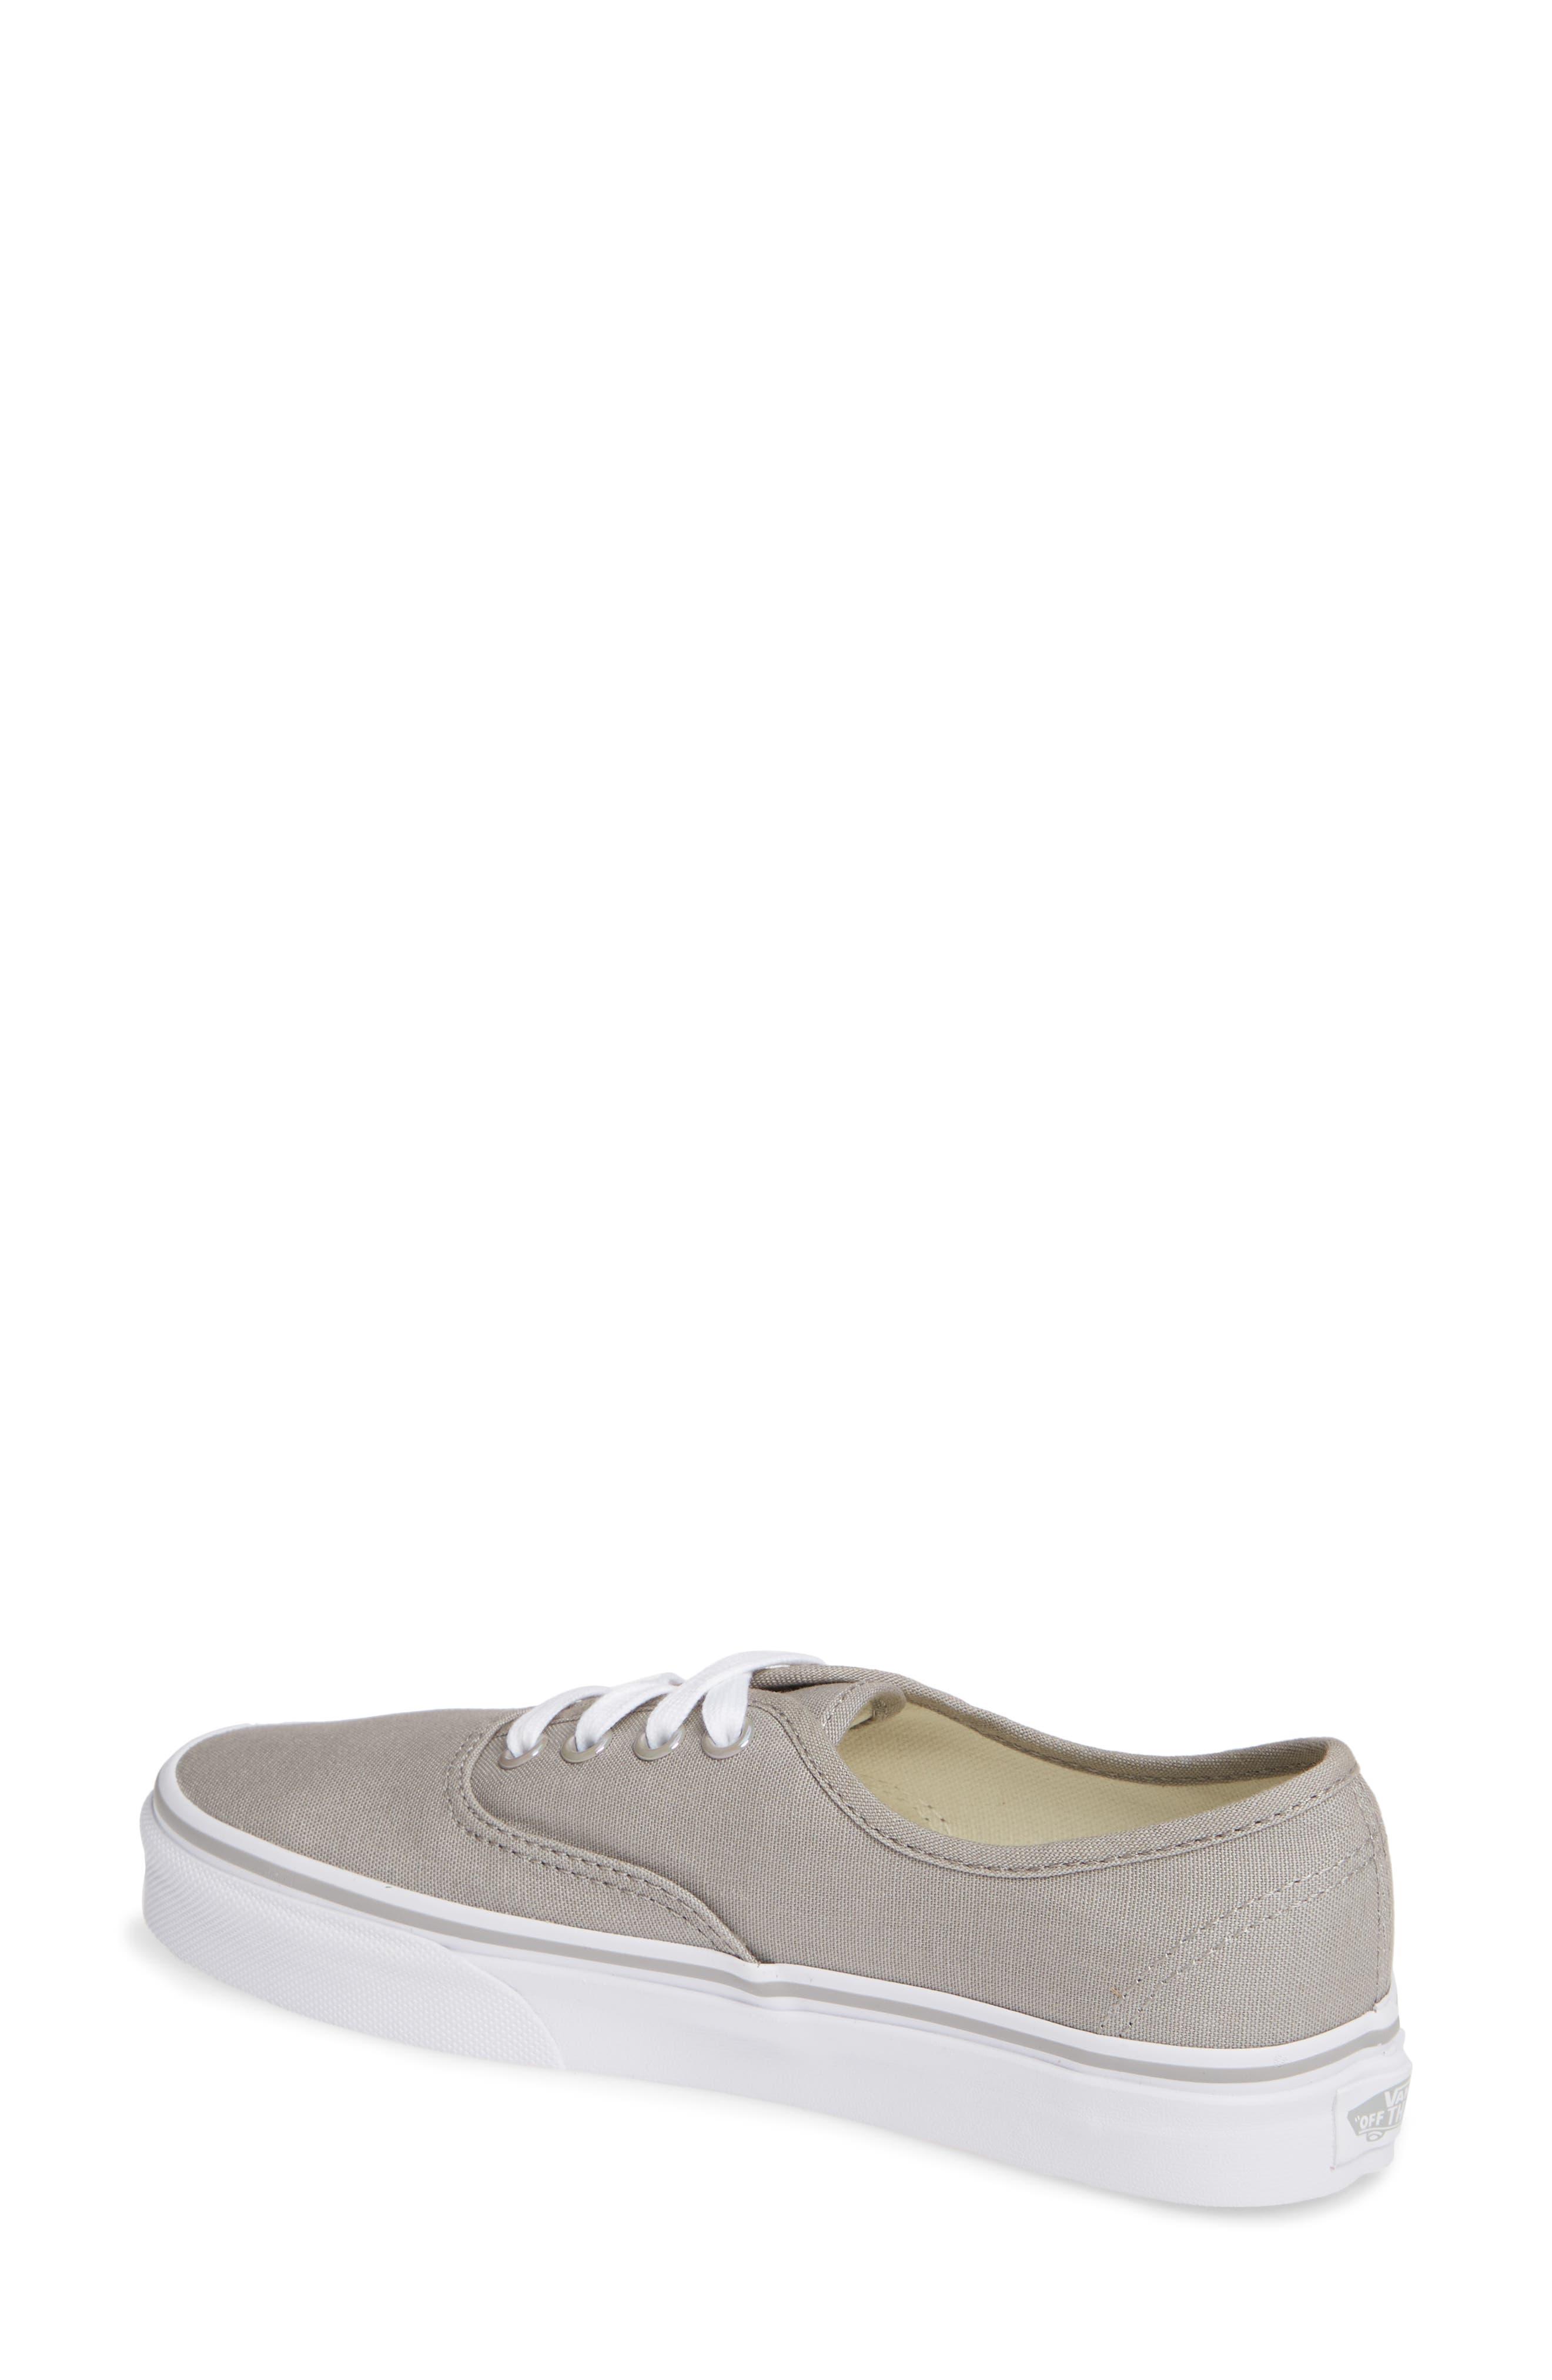 ,                             'Authentic' Sneaker,                             Alternate thumbnail 166, color,                             031